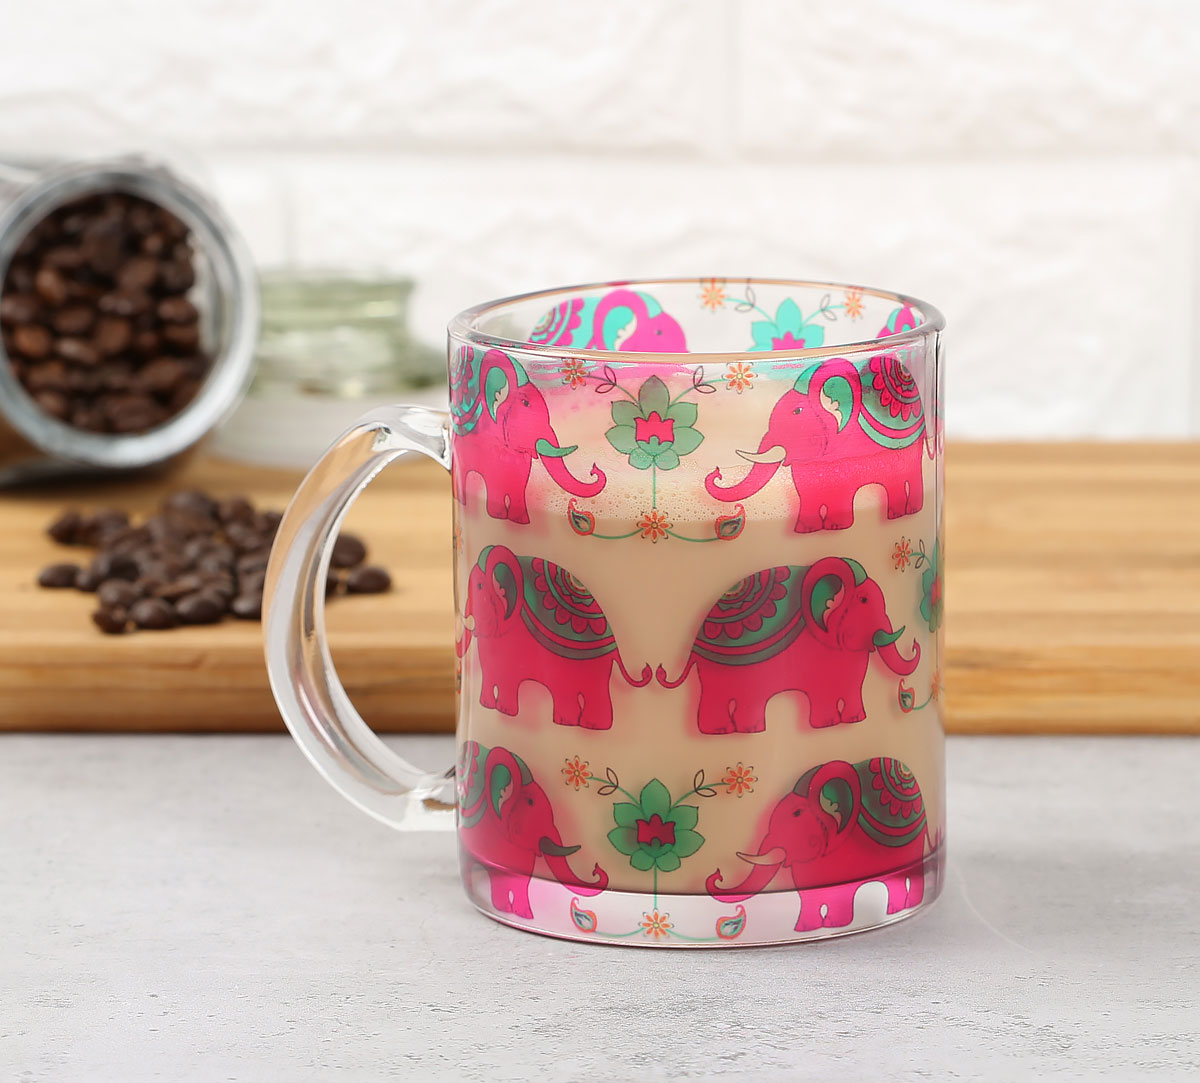 Violet Mastodon's Jamboree Glass Mug